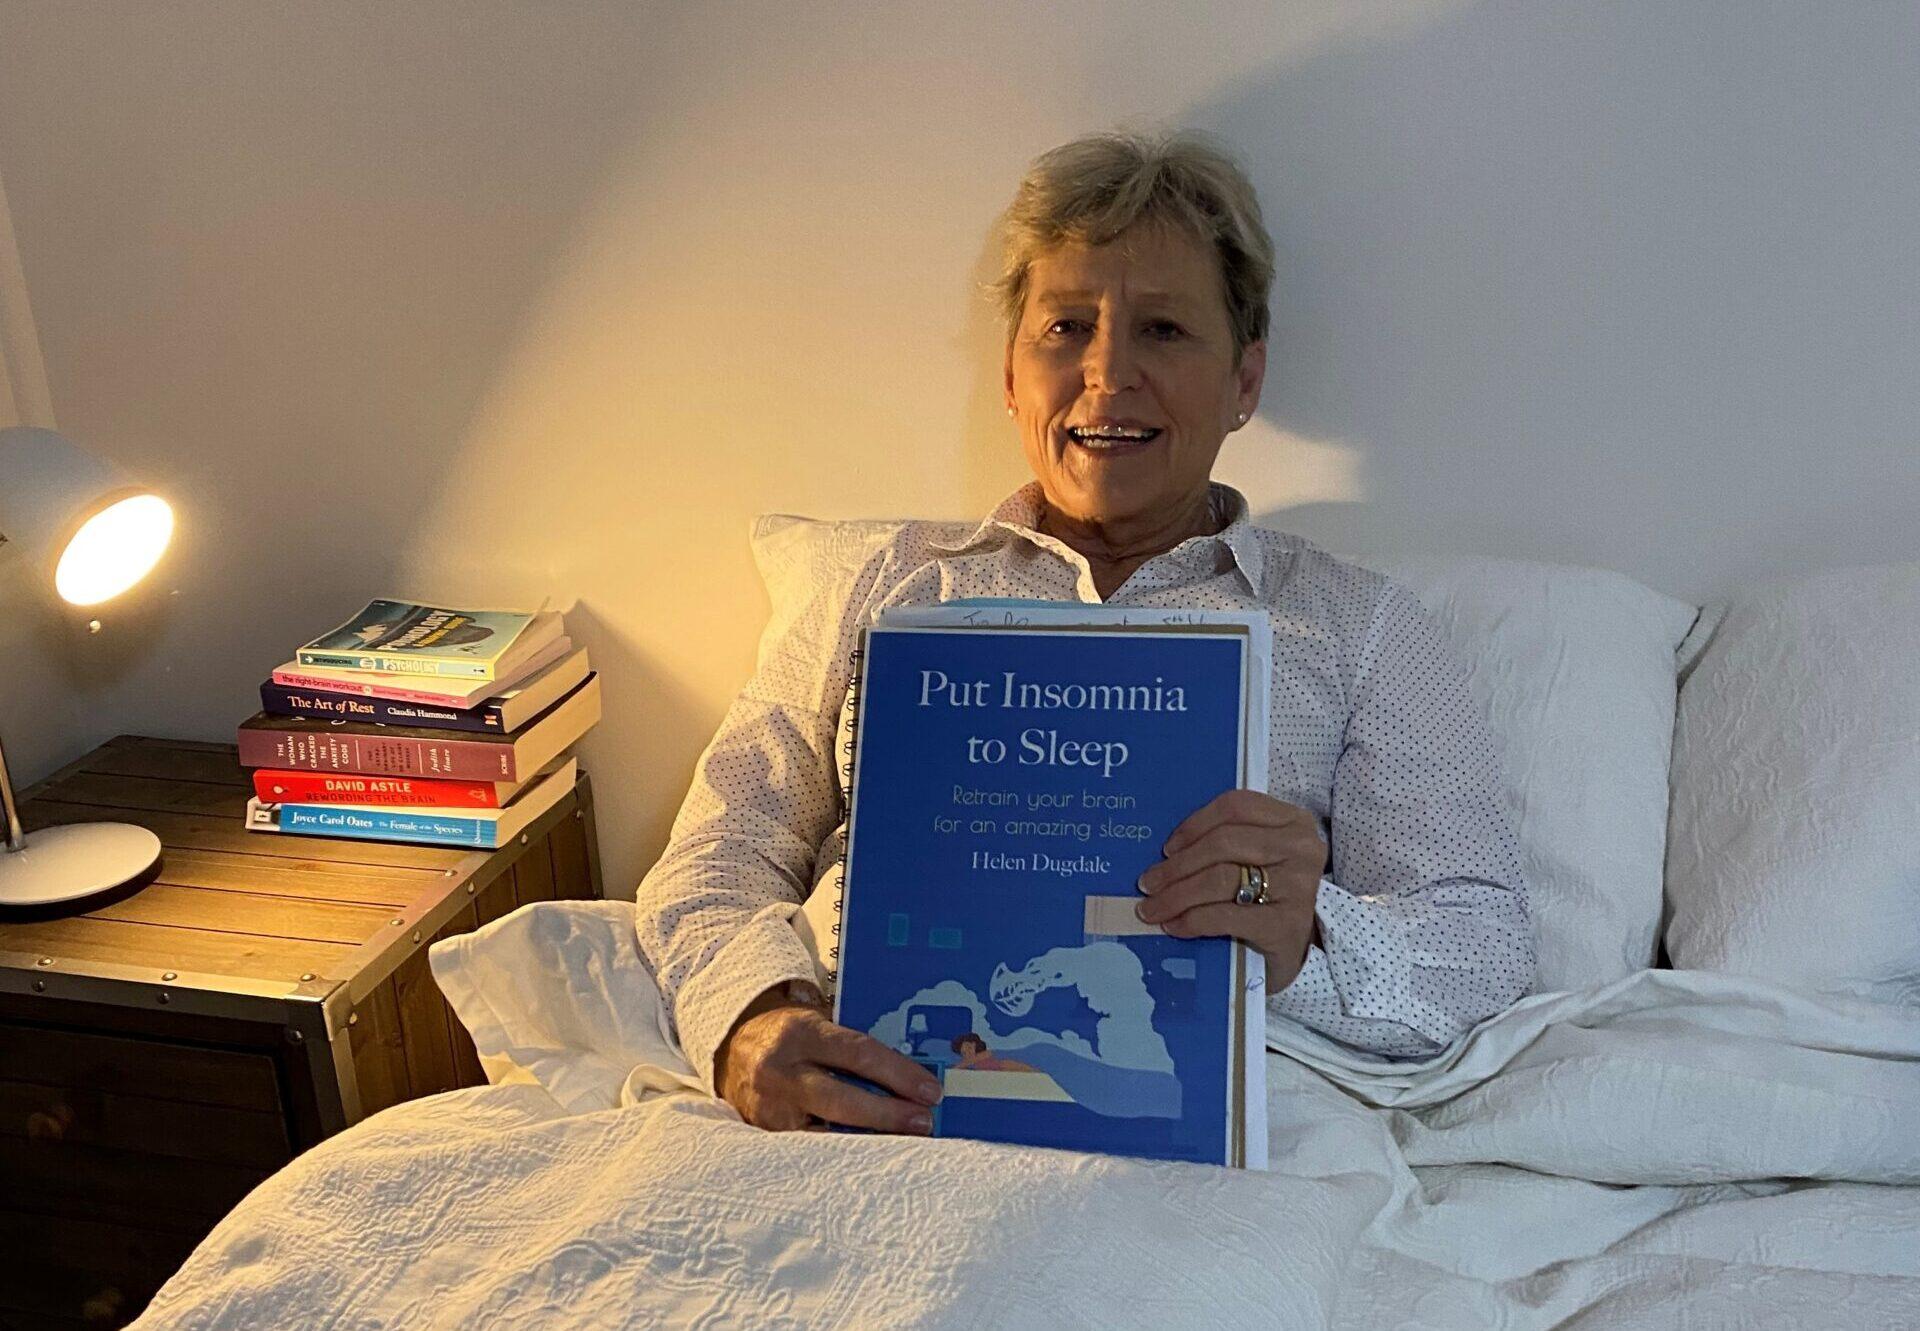 Brain coach seeking input for book about poor sleeping habits